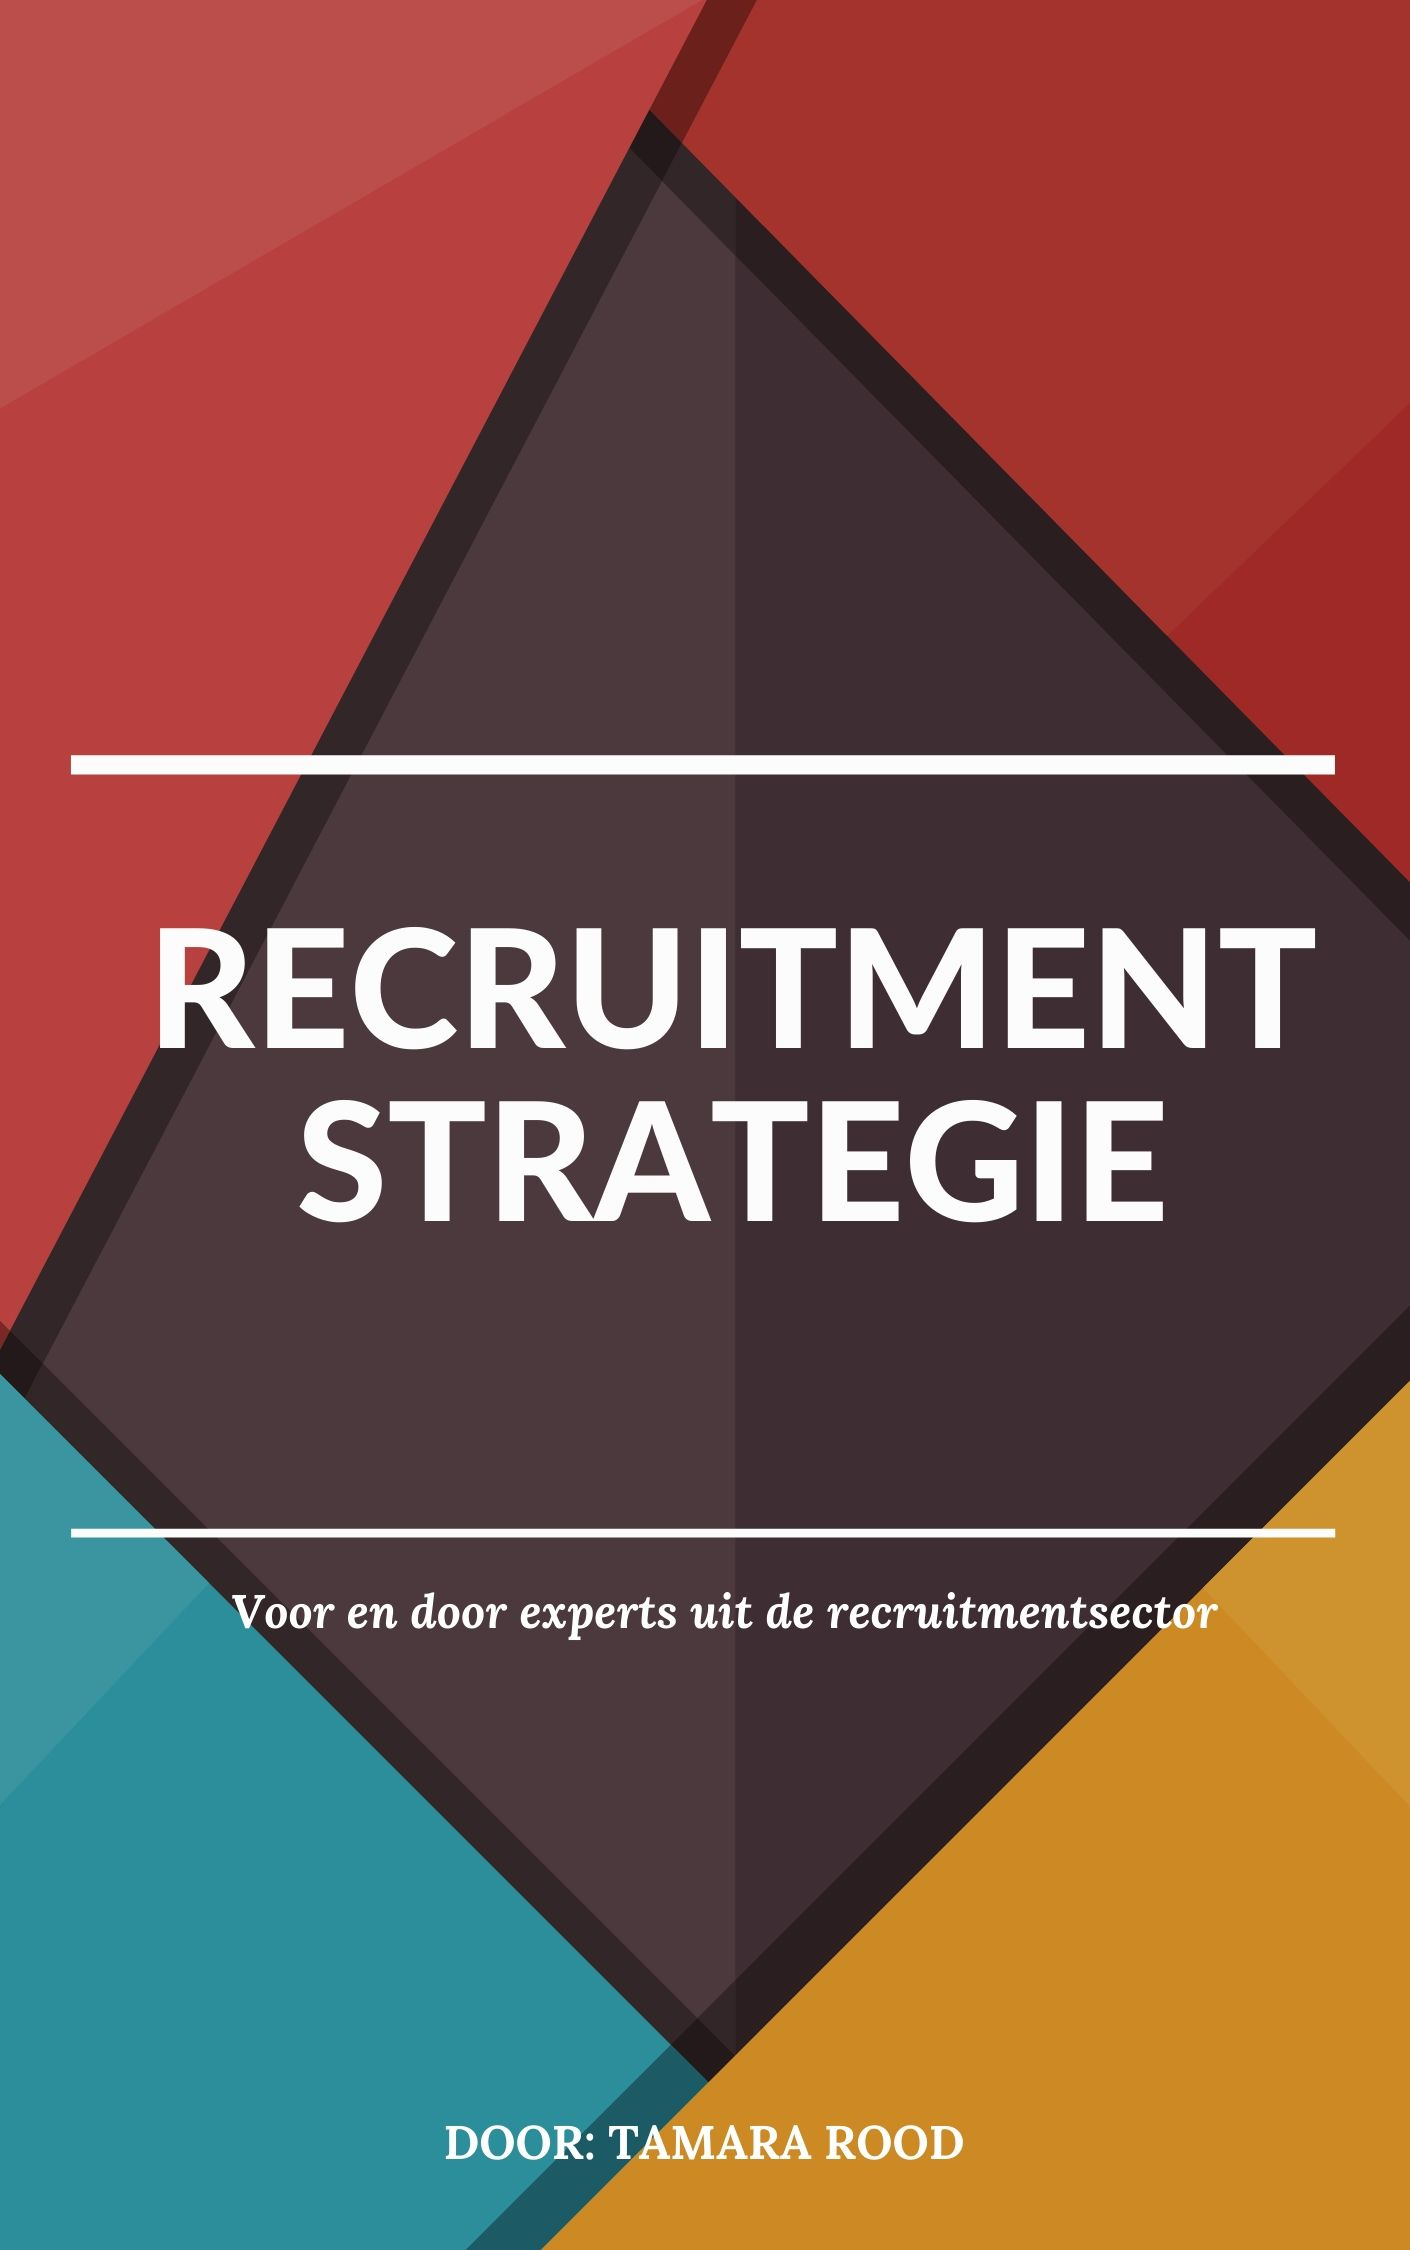 recruitment strategie tamara rood